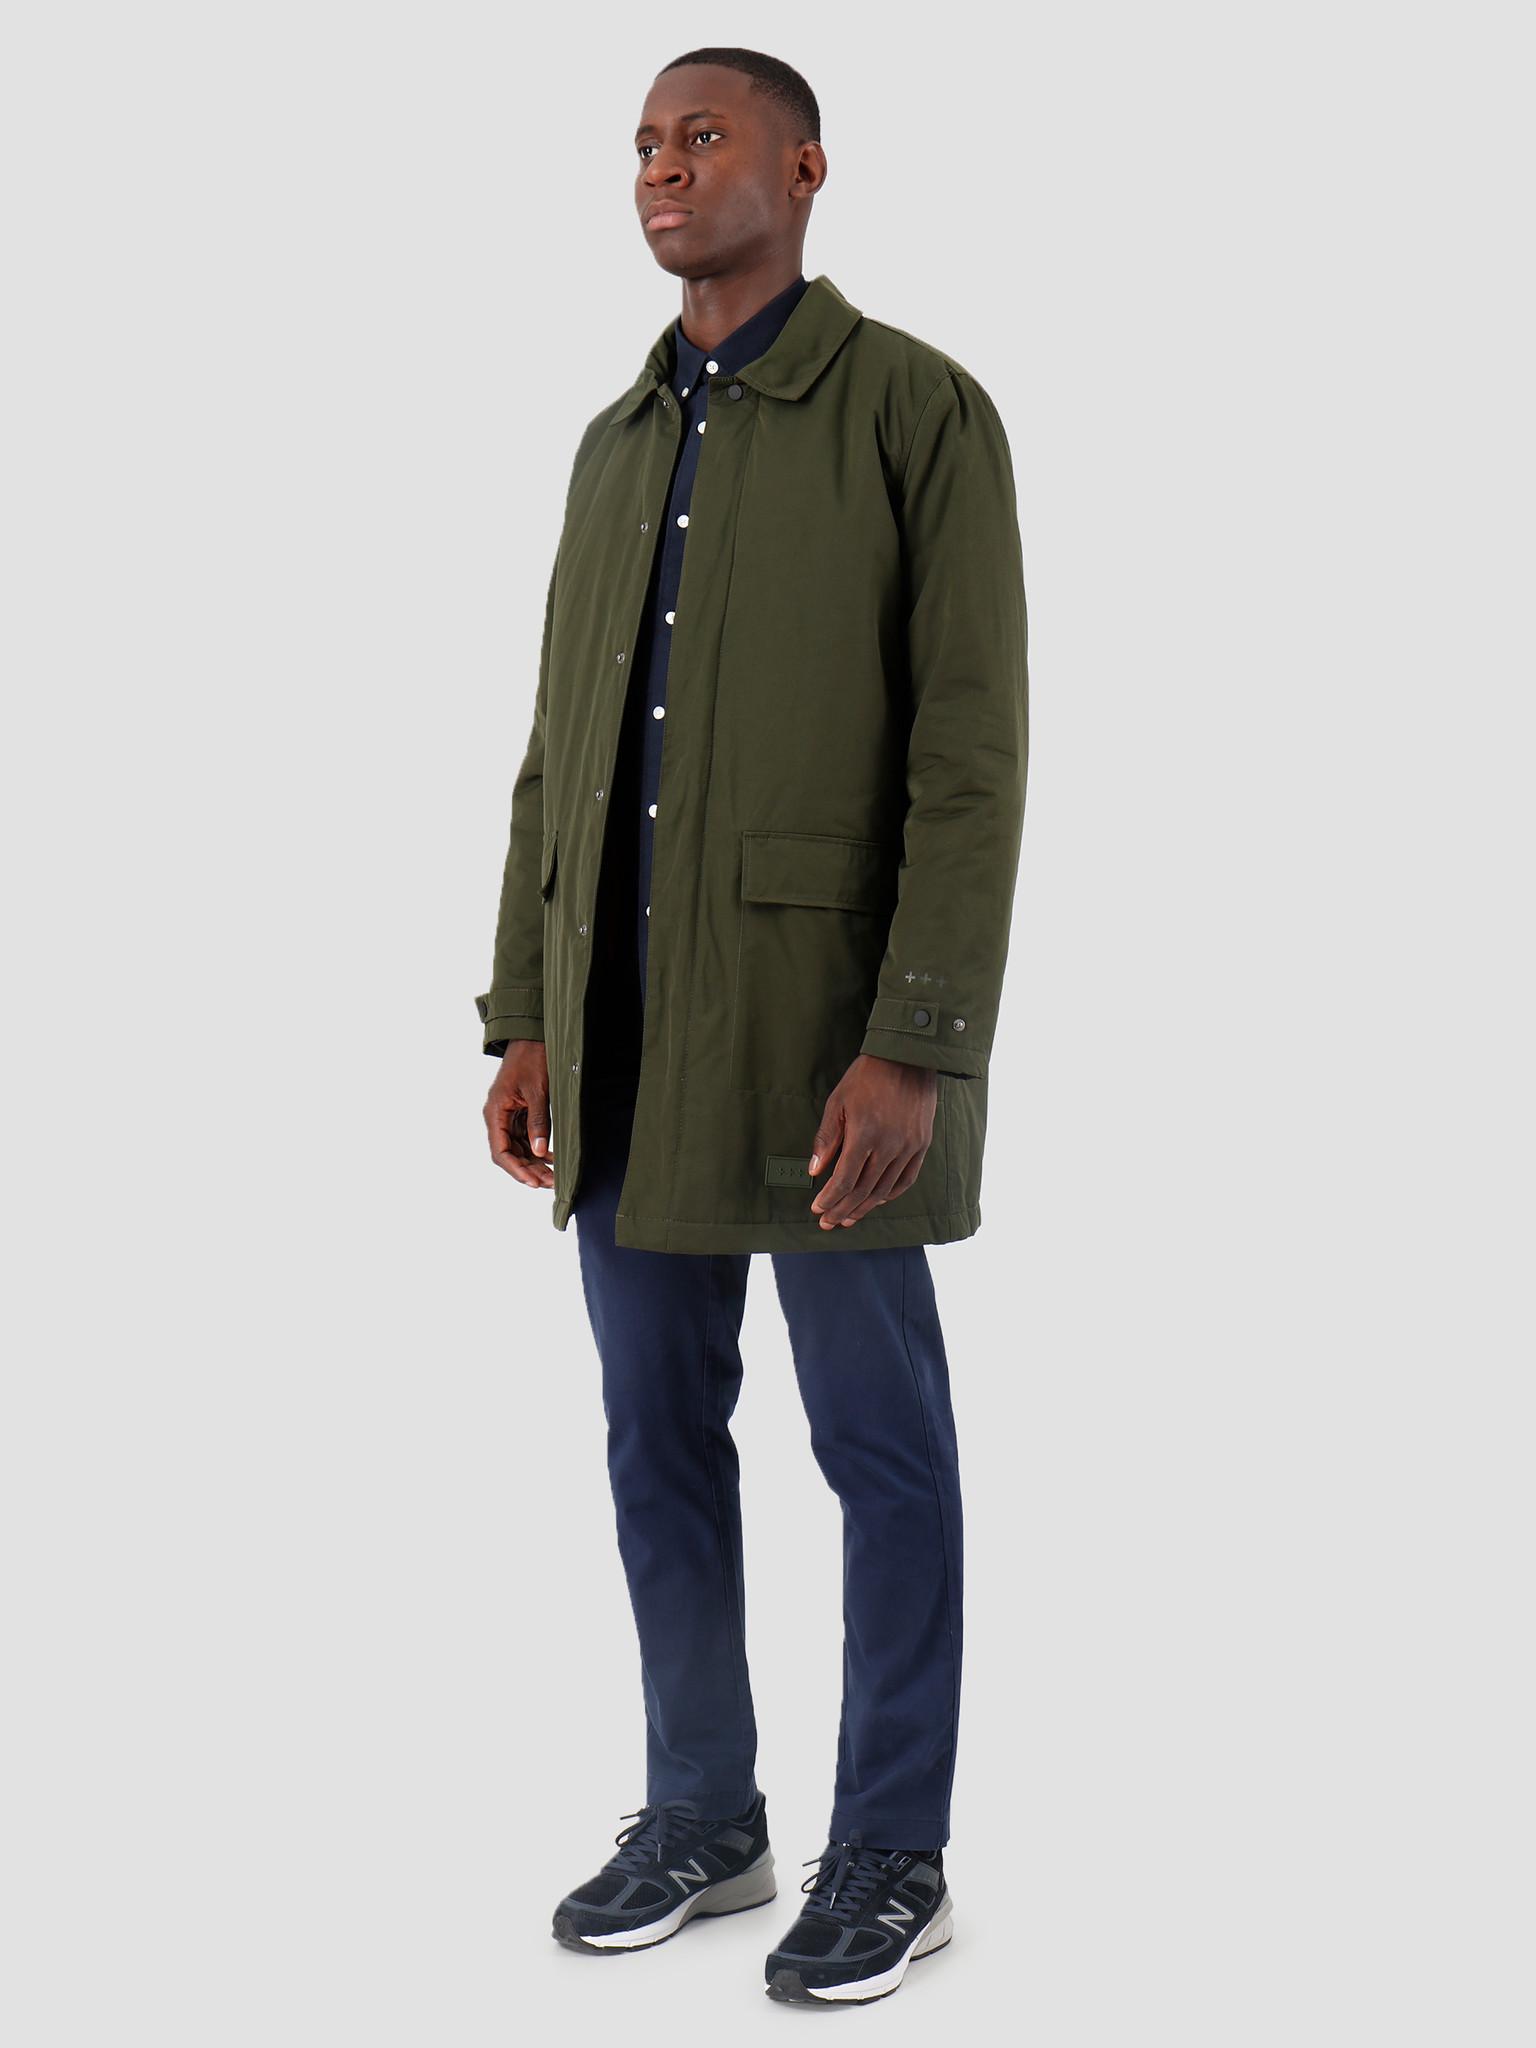 Quality Blanks Quality Blanks QB26 Mac Coat 2-in-1 Green Dark Red